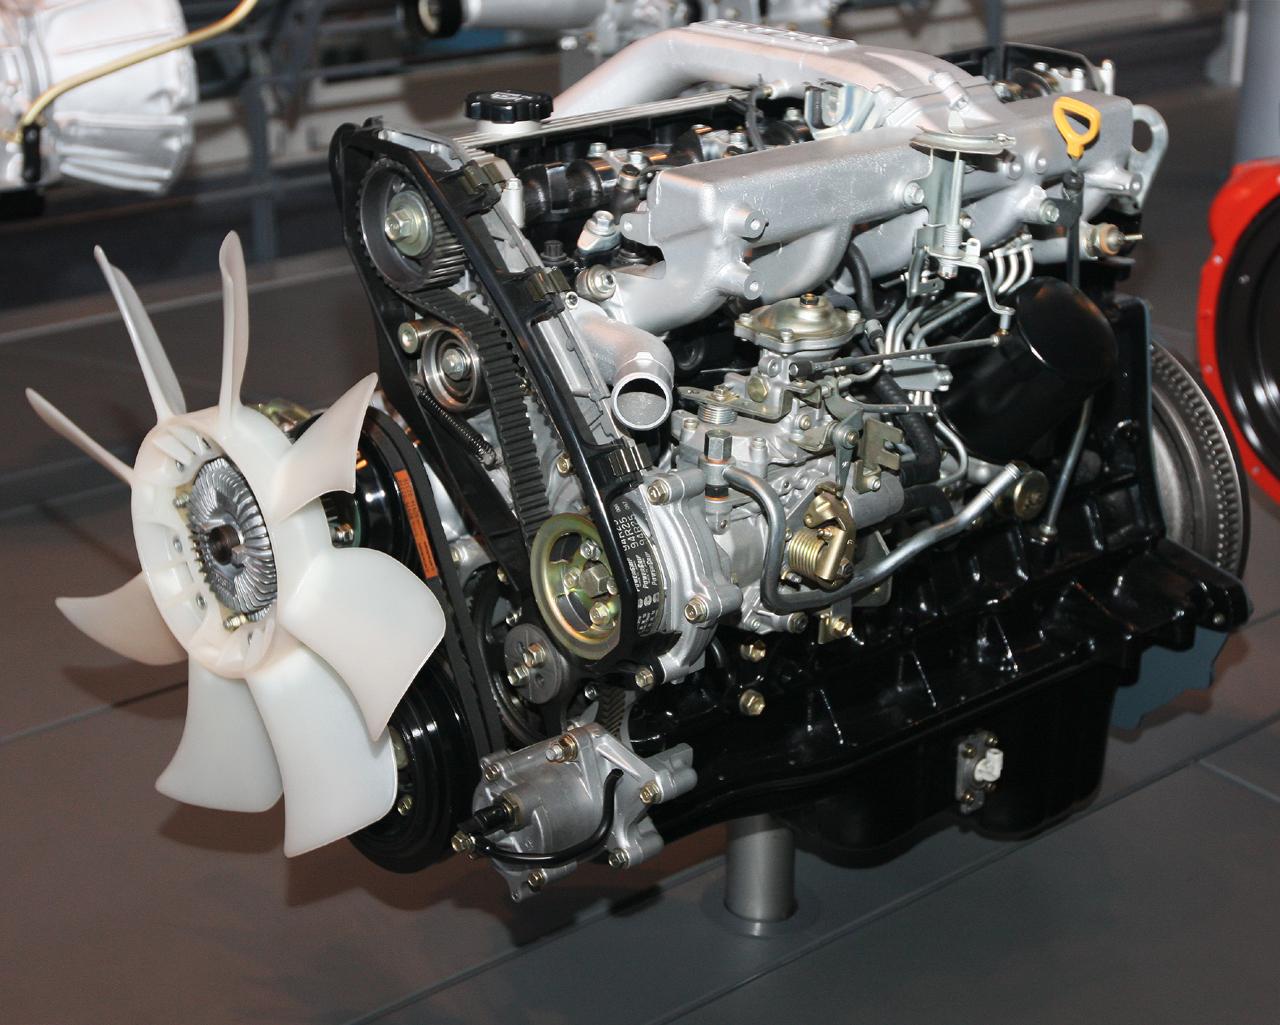 wiring diagram toyota landcruiser 79 series 2006 dodge ram trailer hd engine - wikiwand